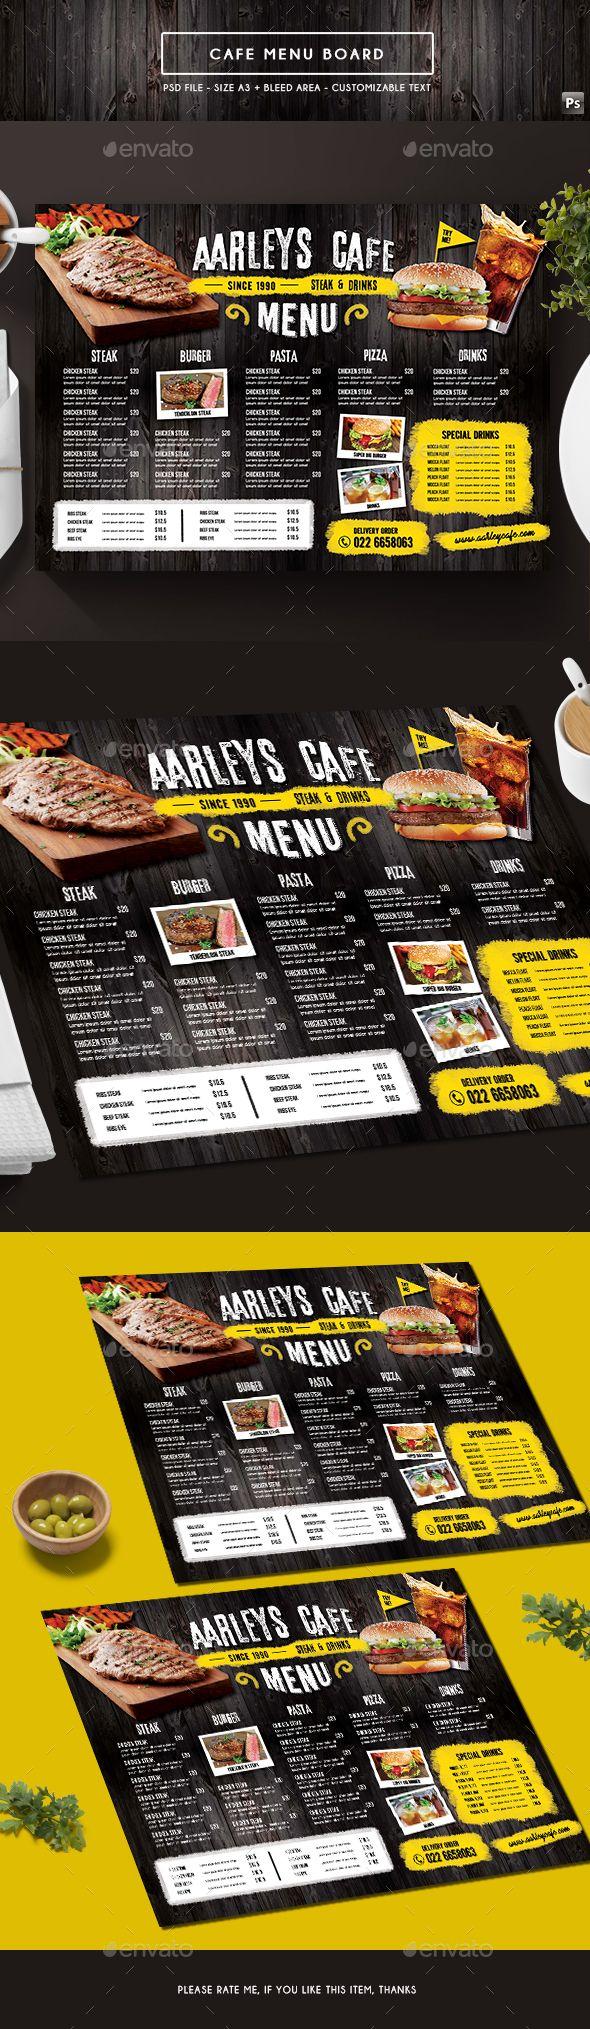 Cafe #Menu Board - #Food Menus Print #Templates Download here:  https://graphicriver.net/item/cafe-menu-board/19518249?ref=alena994